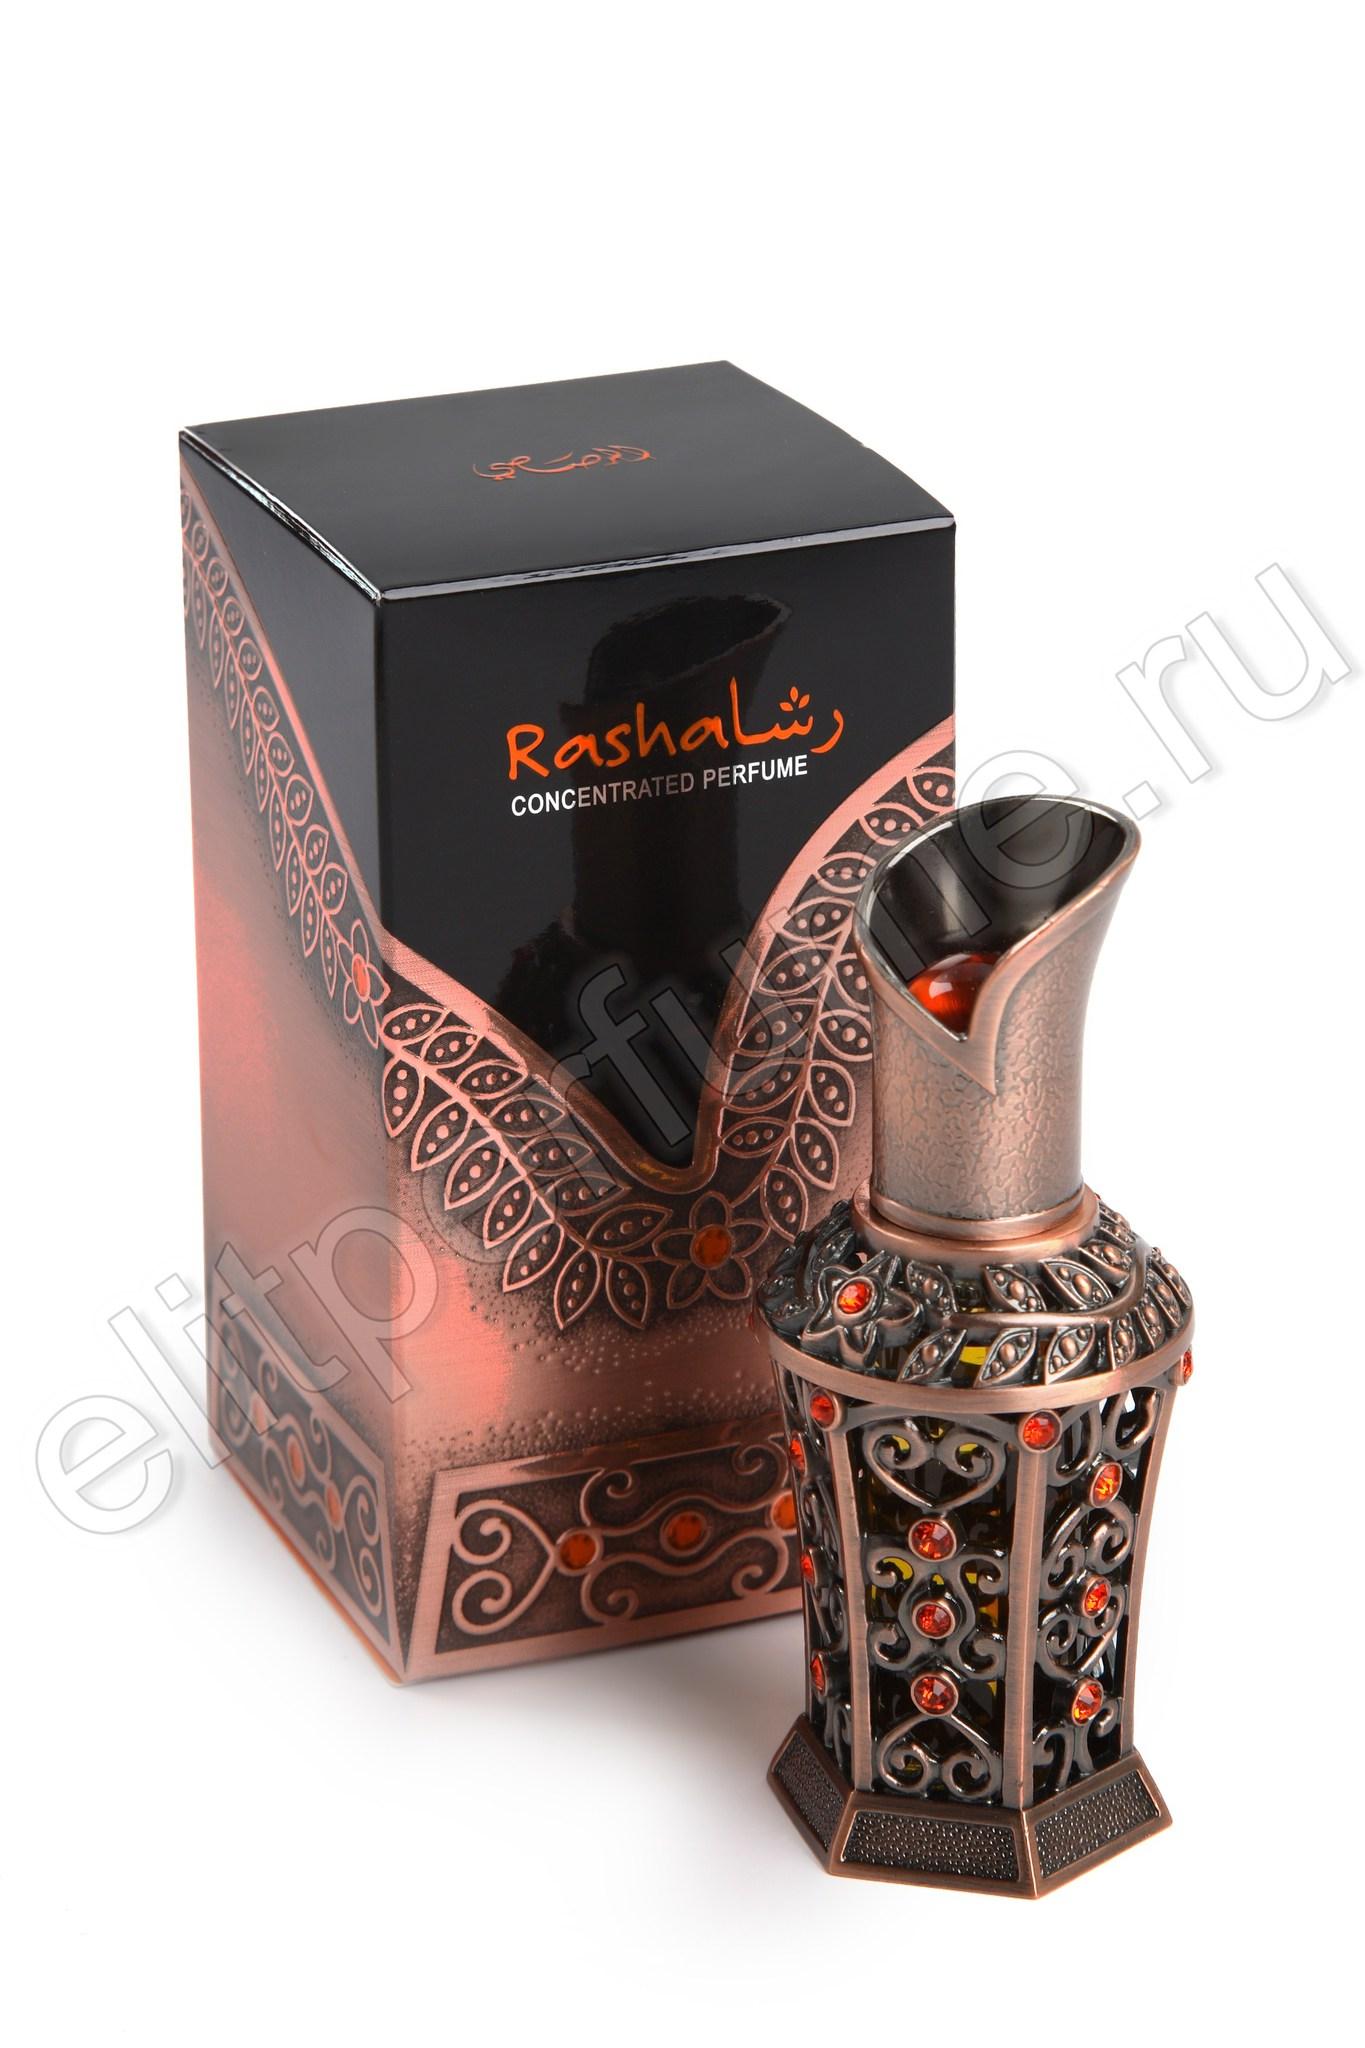 Арабские духи Раша Rasha 12 мл арабские масляные духи от Расаси Rasasi Perfumes